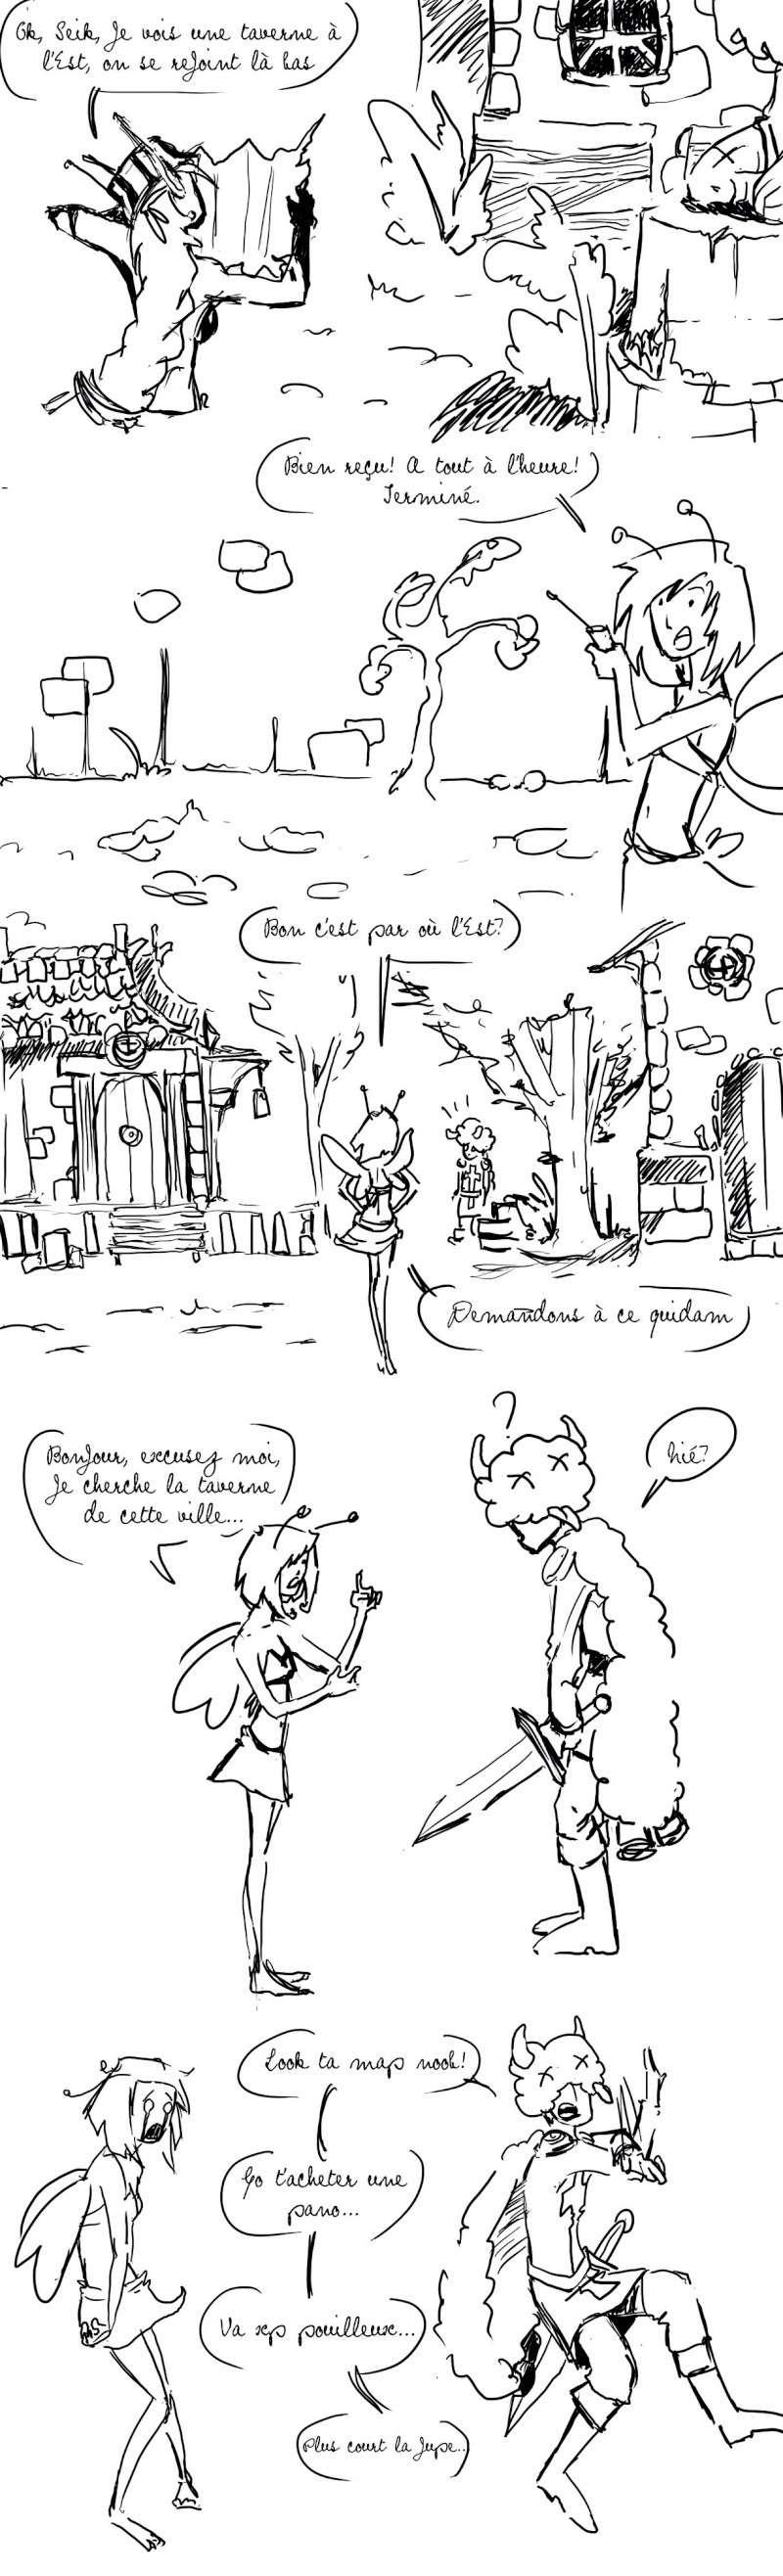 seik et ekis, les aventures ILLUSTREES - Page 4 Strip112